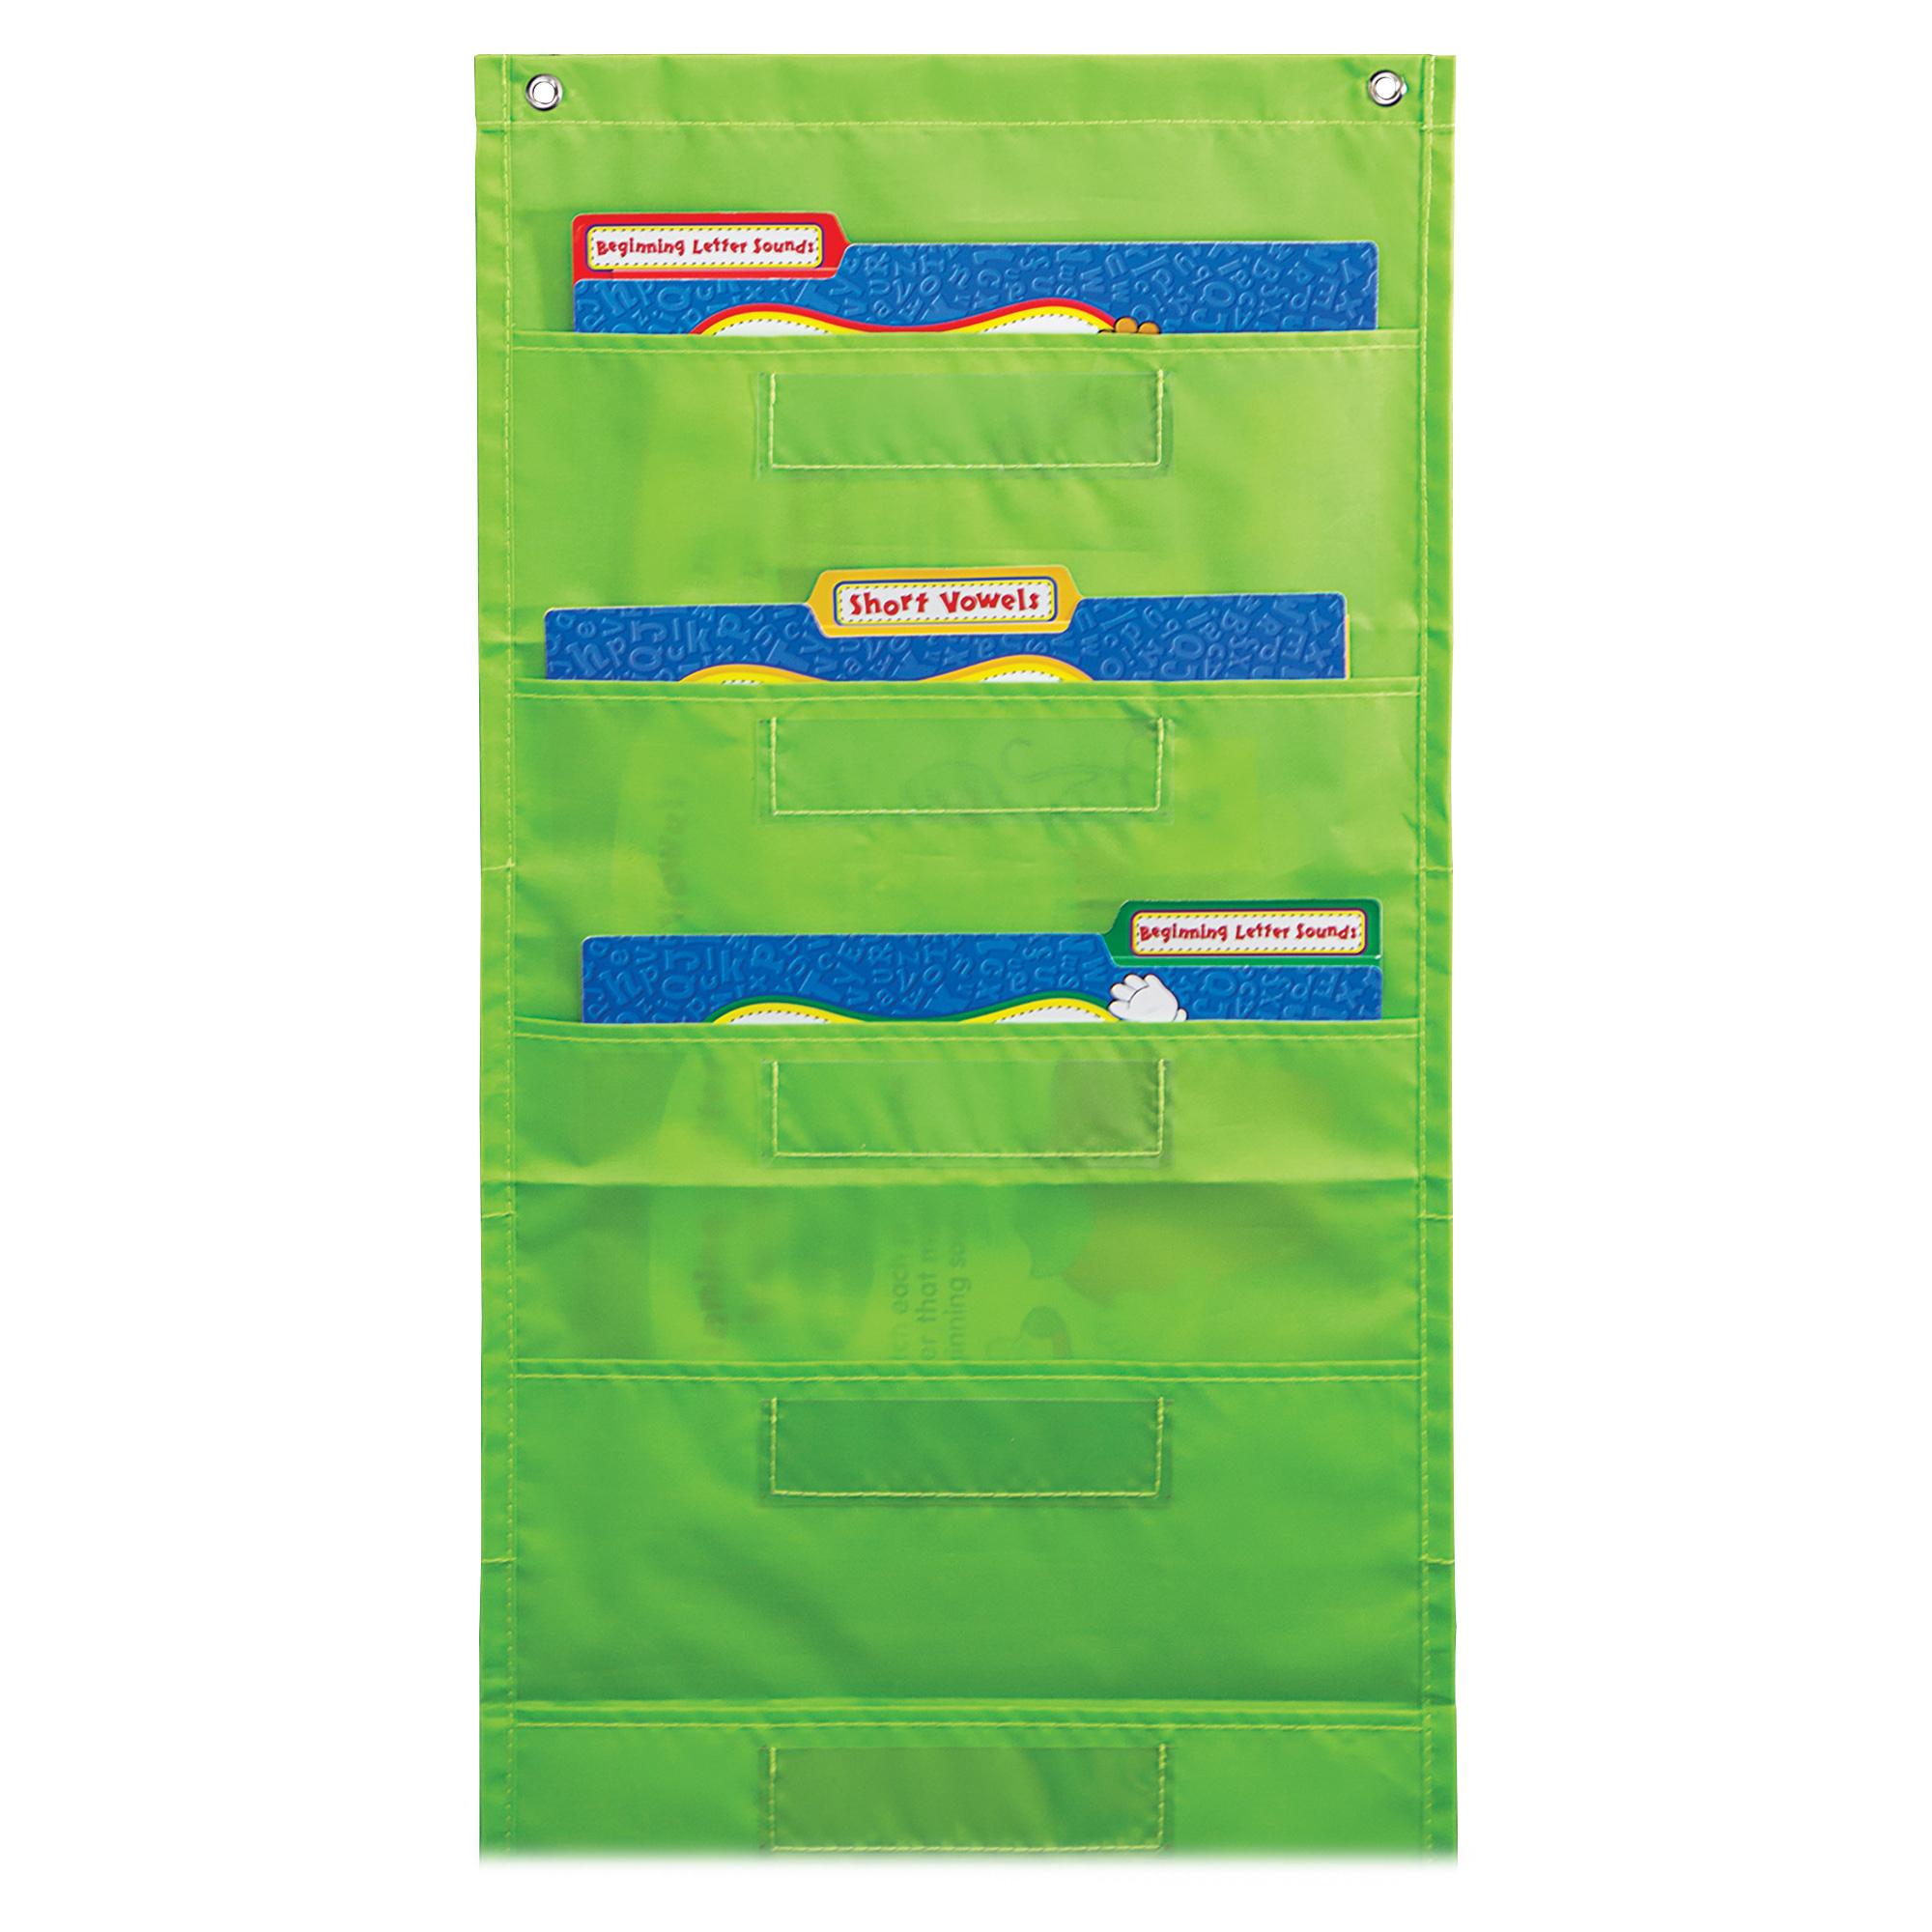 Carson Dellosa File Folder Storage Lime Pocket Chart